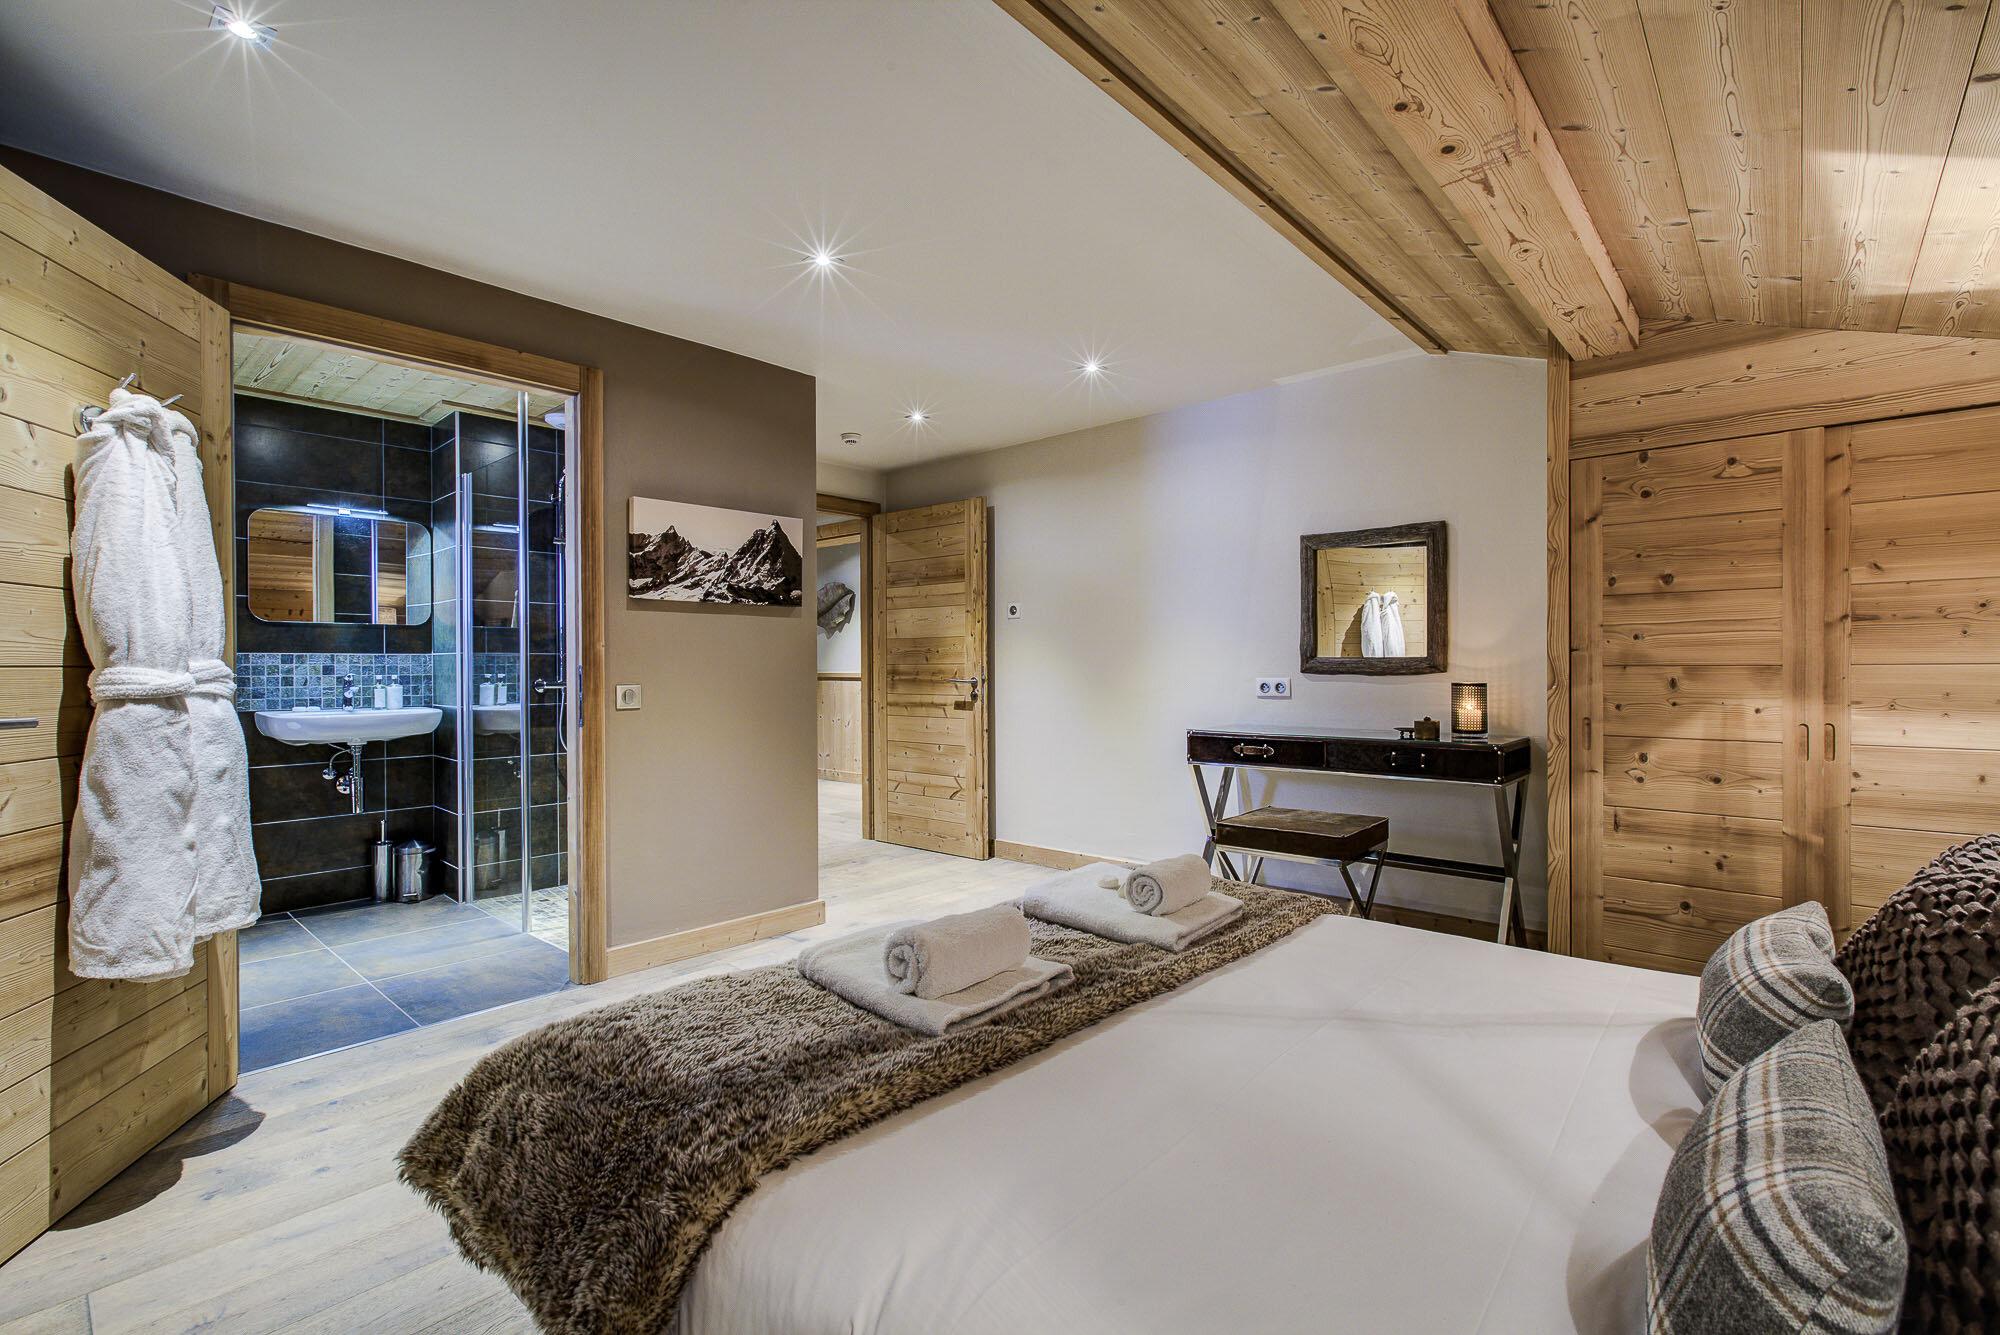 tg-ski-luxury-chalet-les-pierrys-morzine-009.jpg